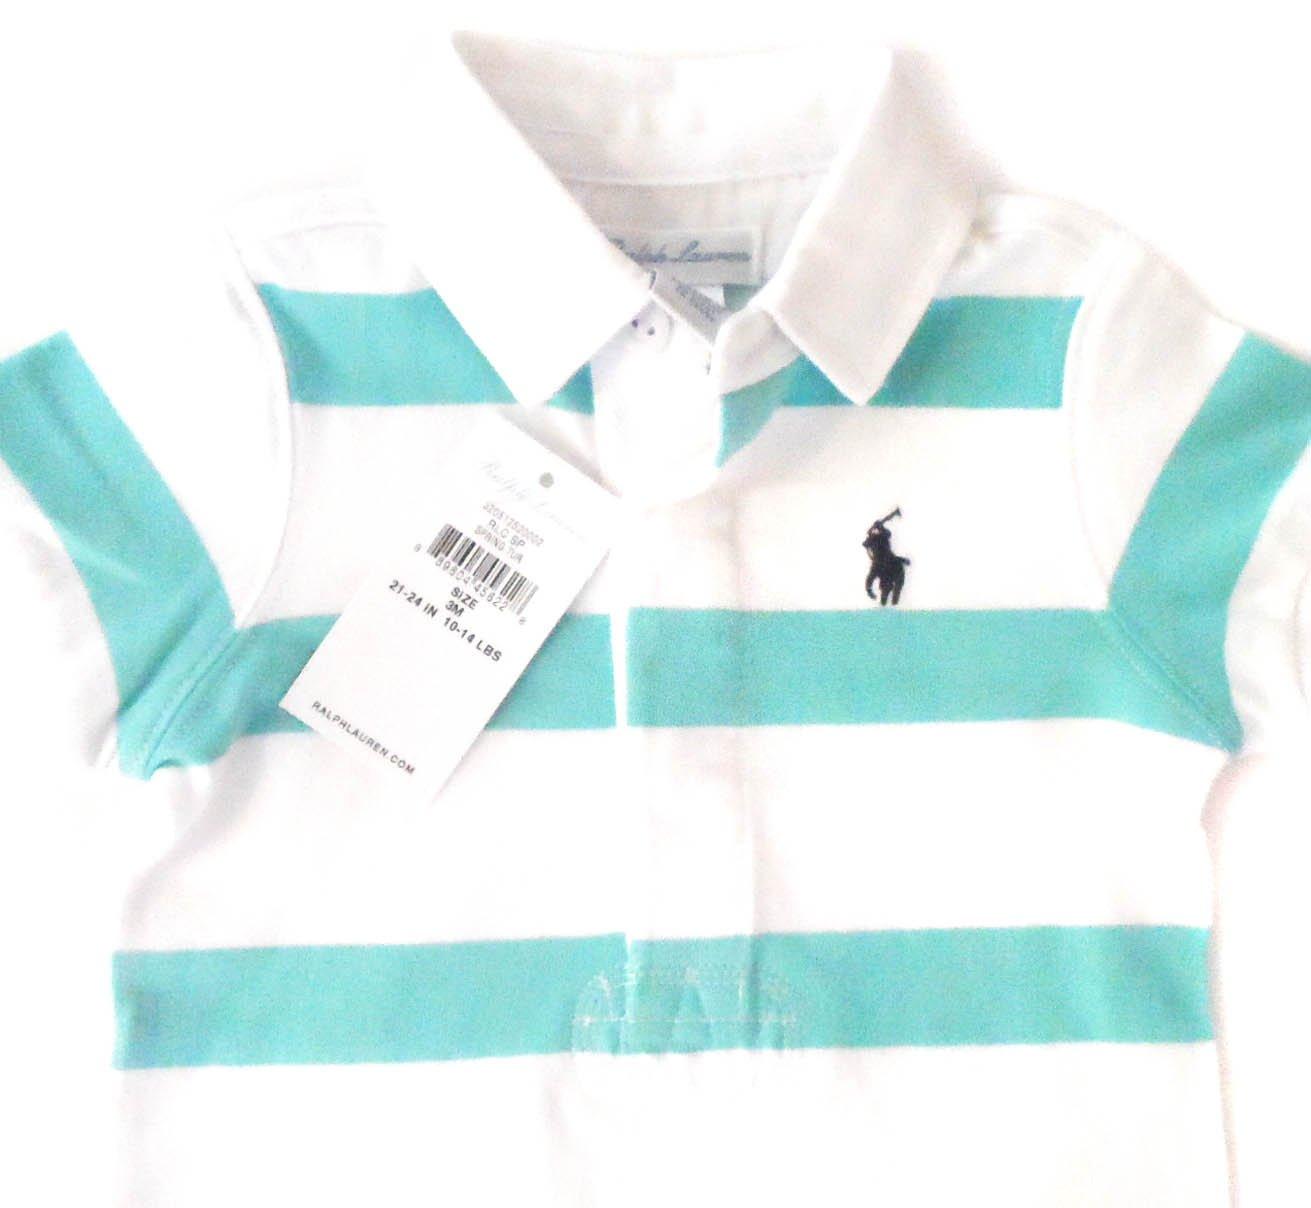 New Genuine Ralph Lauren bebé niños rayas Shortall 20002 - Babygrow Pelele - Muelle Turquesa turquesa Talla:3 meses: Amazon.es: Bebé